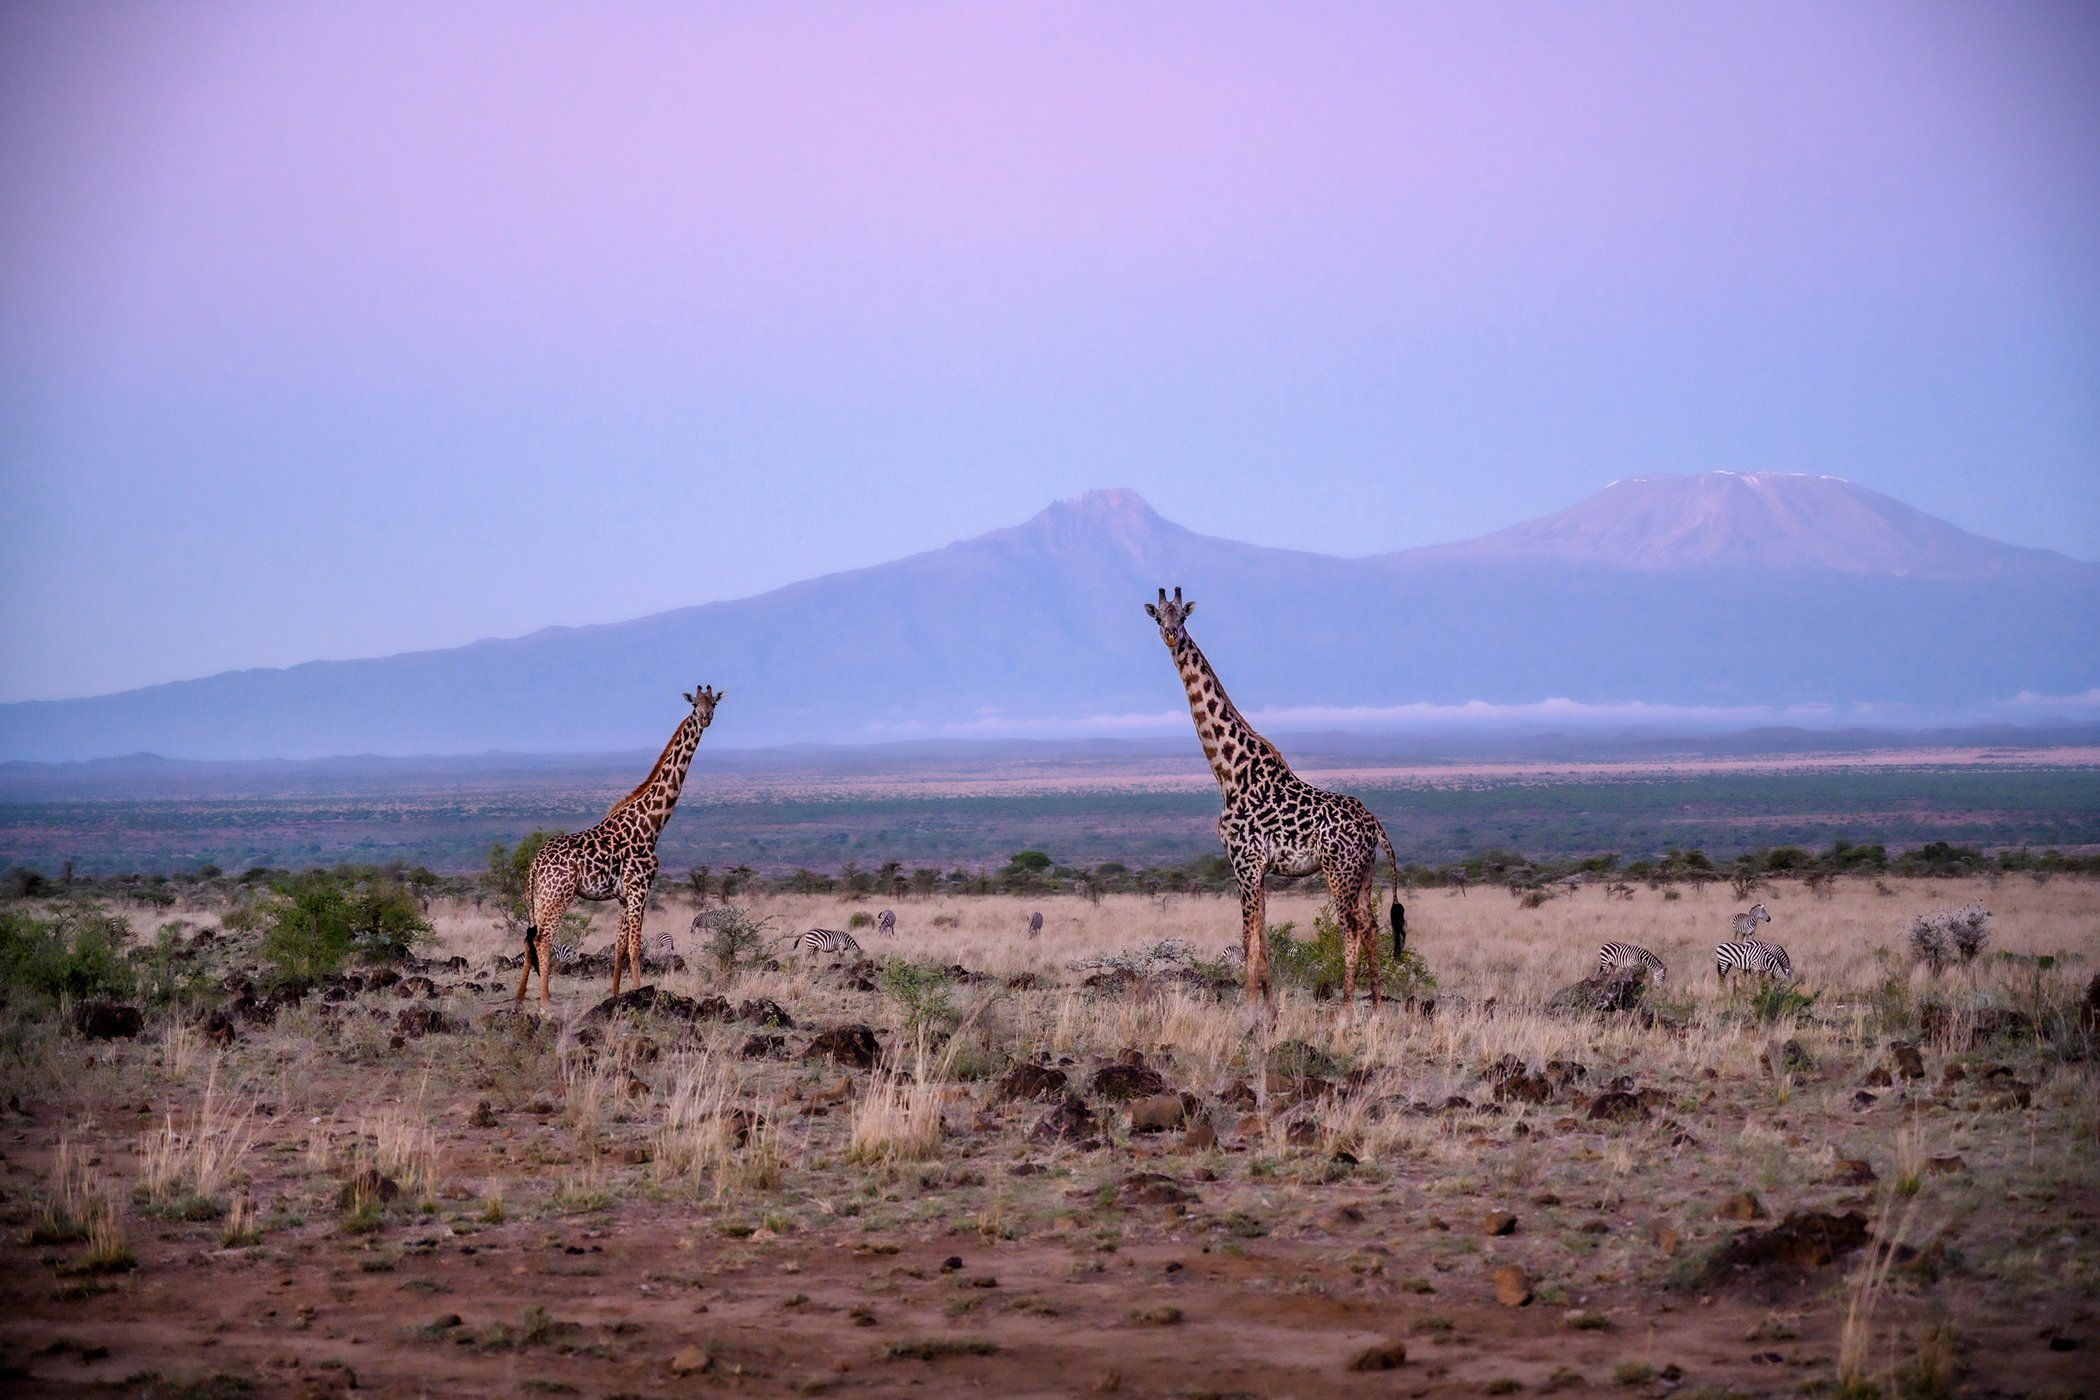 Chyulu Hills-Kenya-Conservation-Covid-19-Impacts-001.jpg